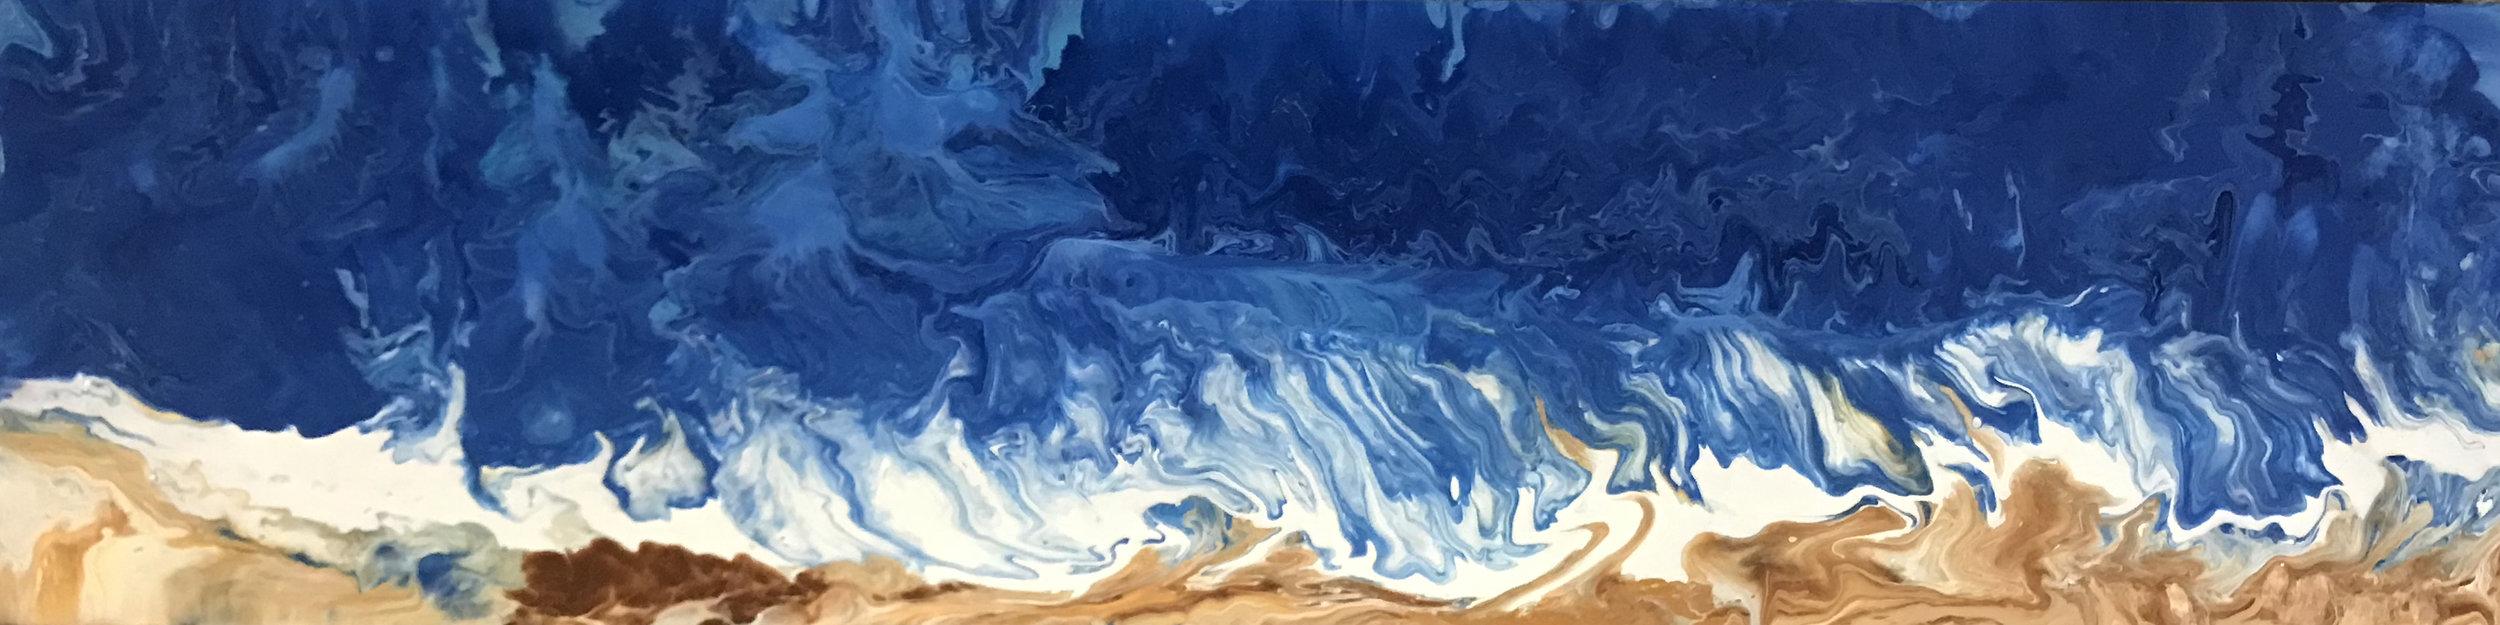 YaniPaints - Life is a Beach - acrylic on wood panel - 12x48 - 2016 - $1500.jpg